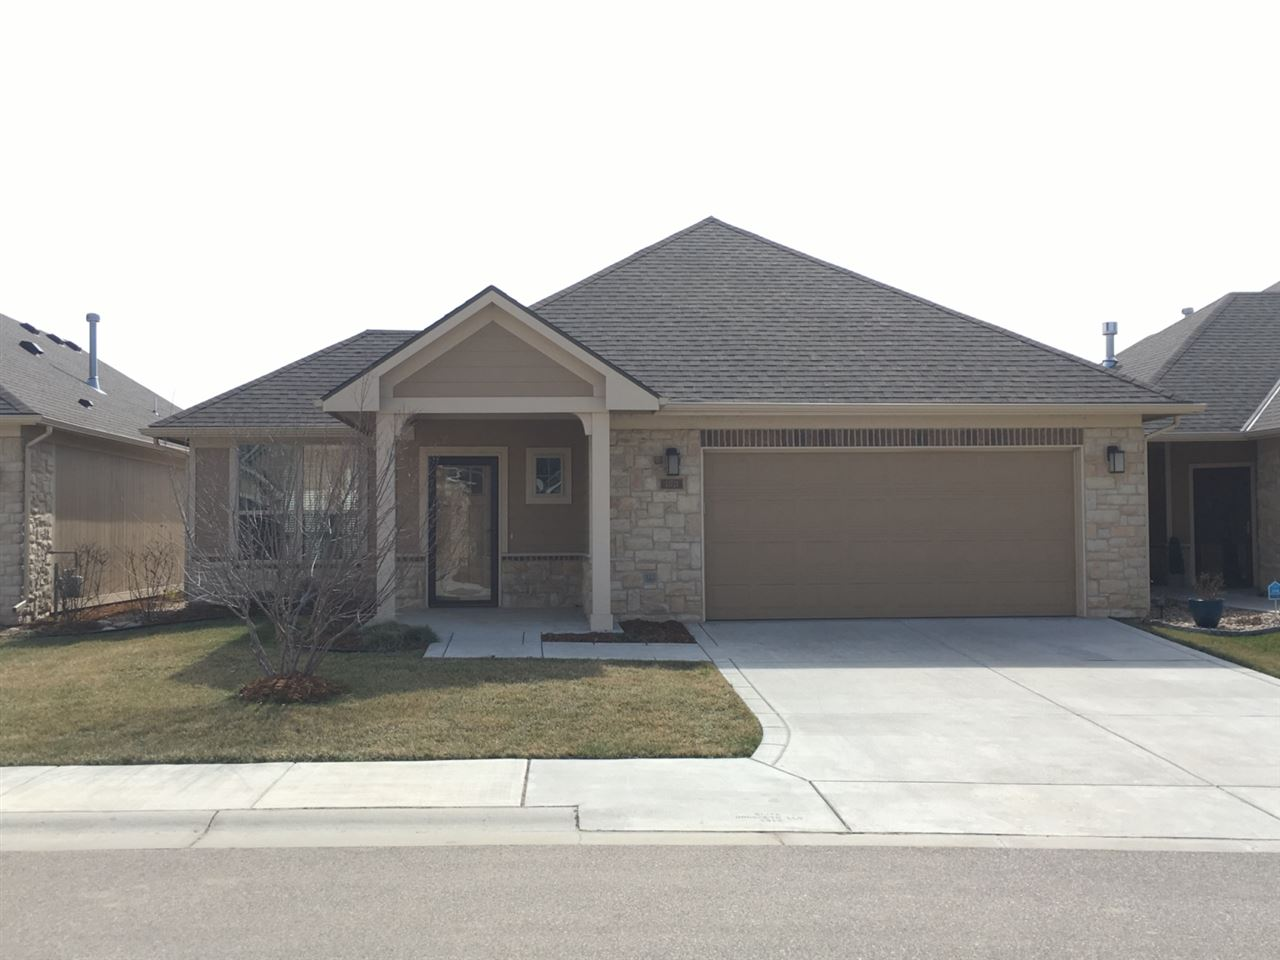 13721 W VERONA ST, Wichita, KS 67235